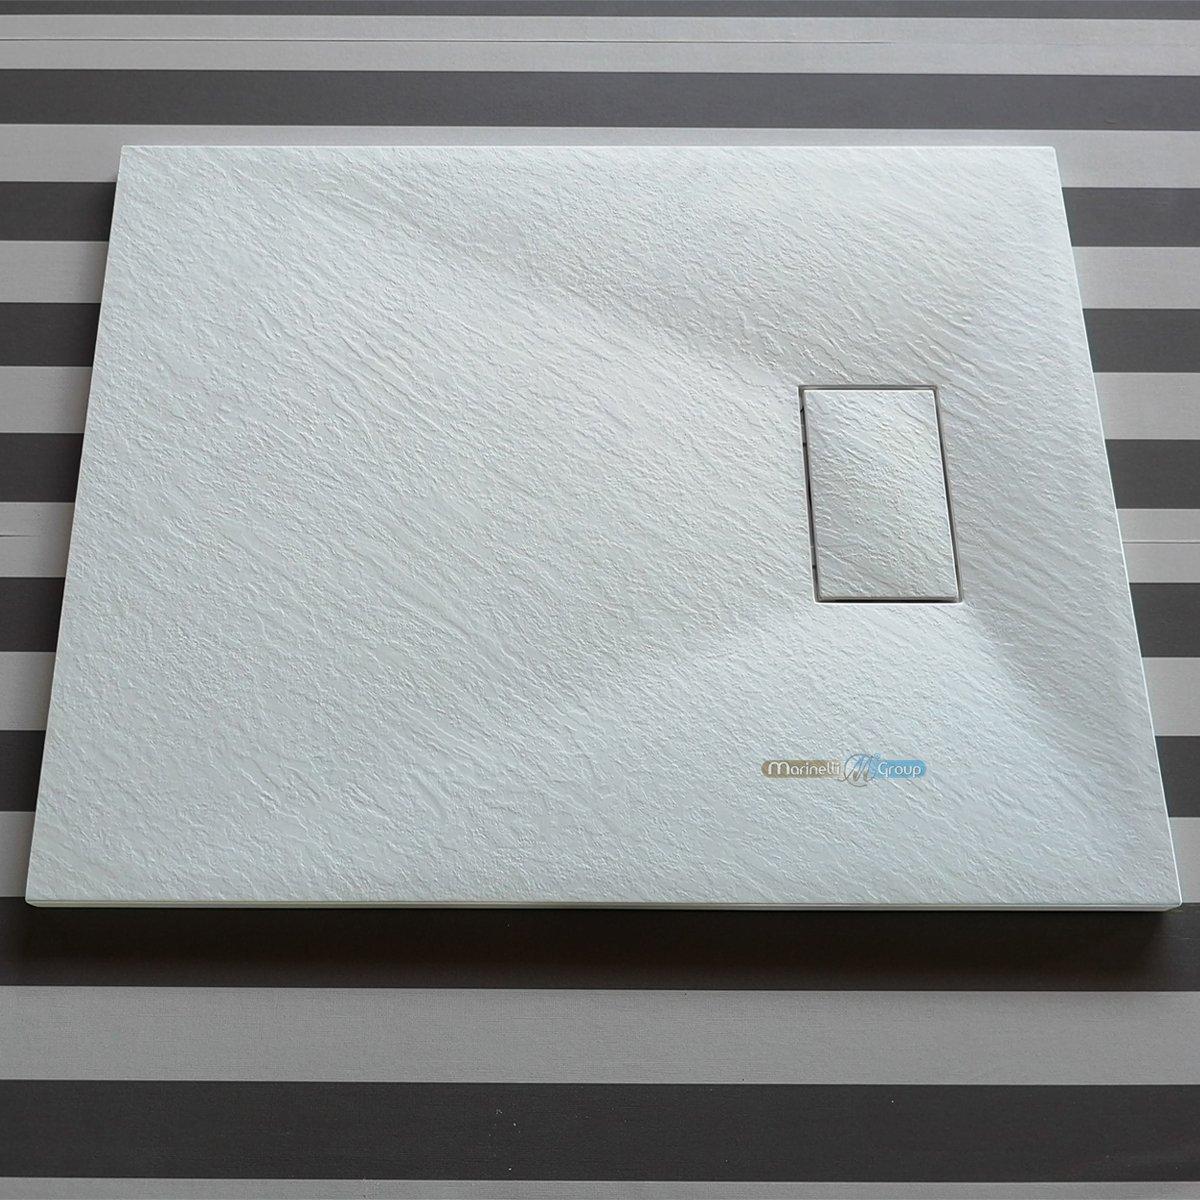 Piatto doccia effetto pietra ardesia stone smc BEIGE BIANCO NERO 70 80 90 100 120 140 160 cm piletta inclusa. Euclide (80x120 cm, Beige) MarinelliGroup